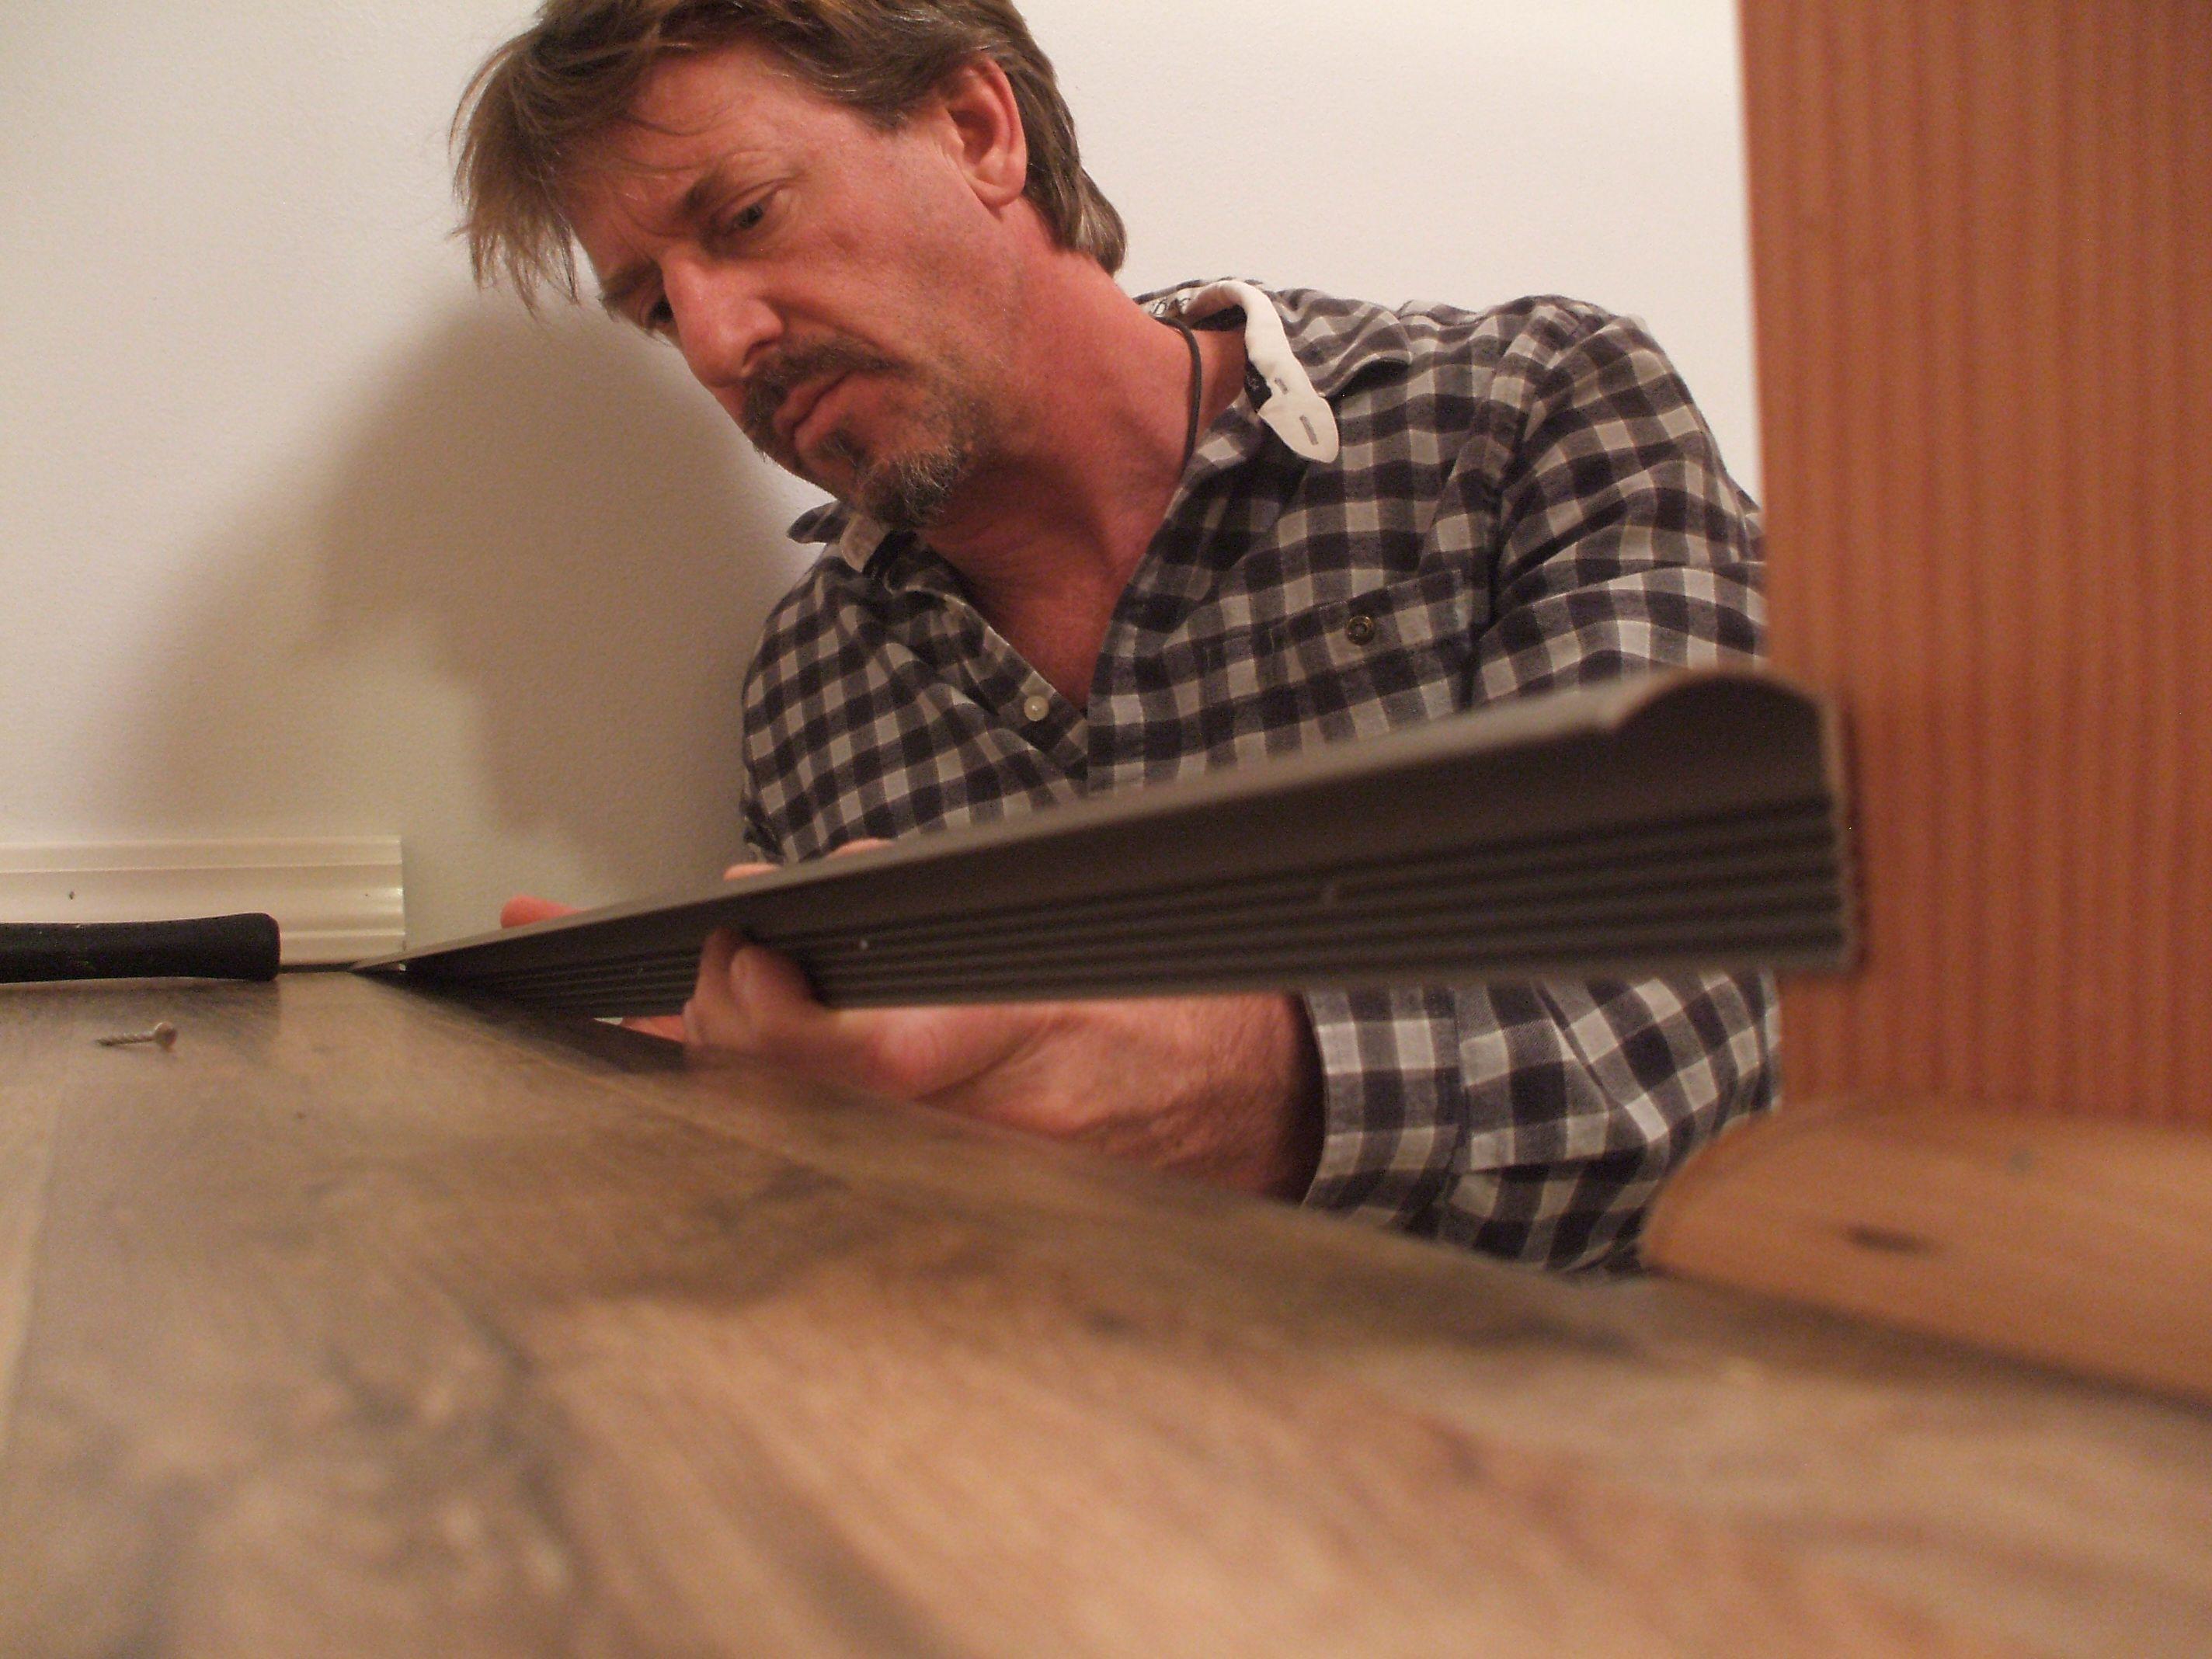 hardwood floor nosing of how to install a stair nosing strip throughout placing edging strip 56a49e5c3df78cf772834b64 jpg